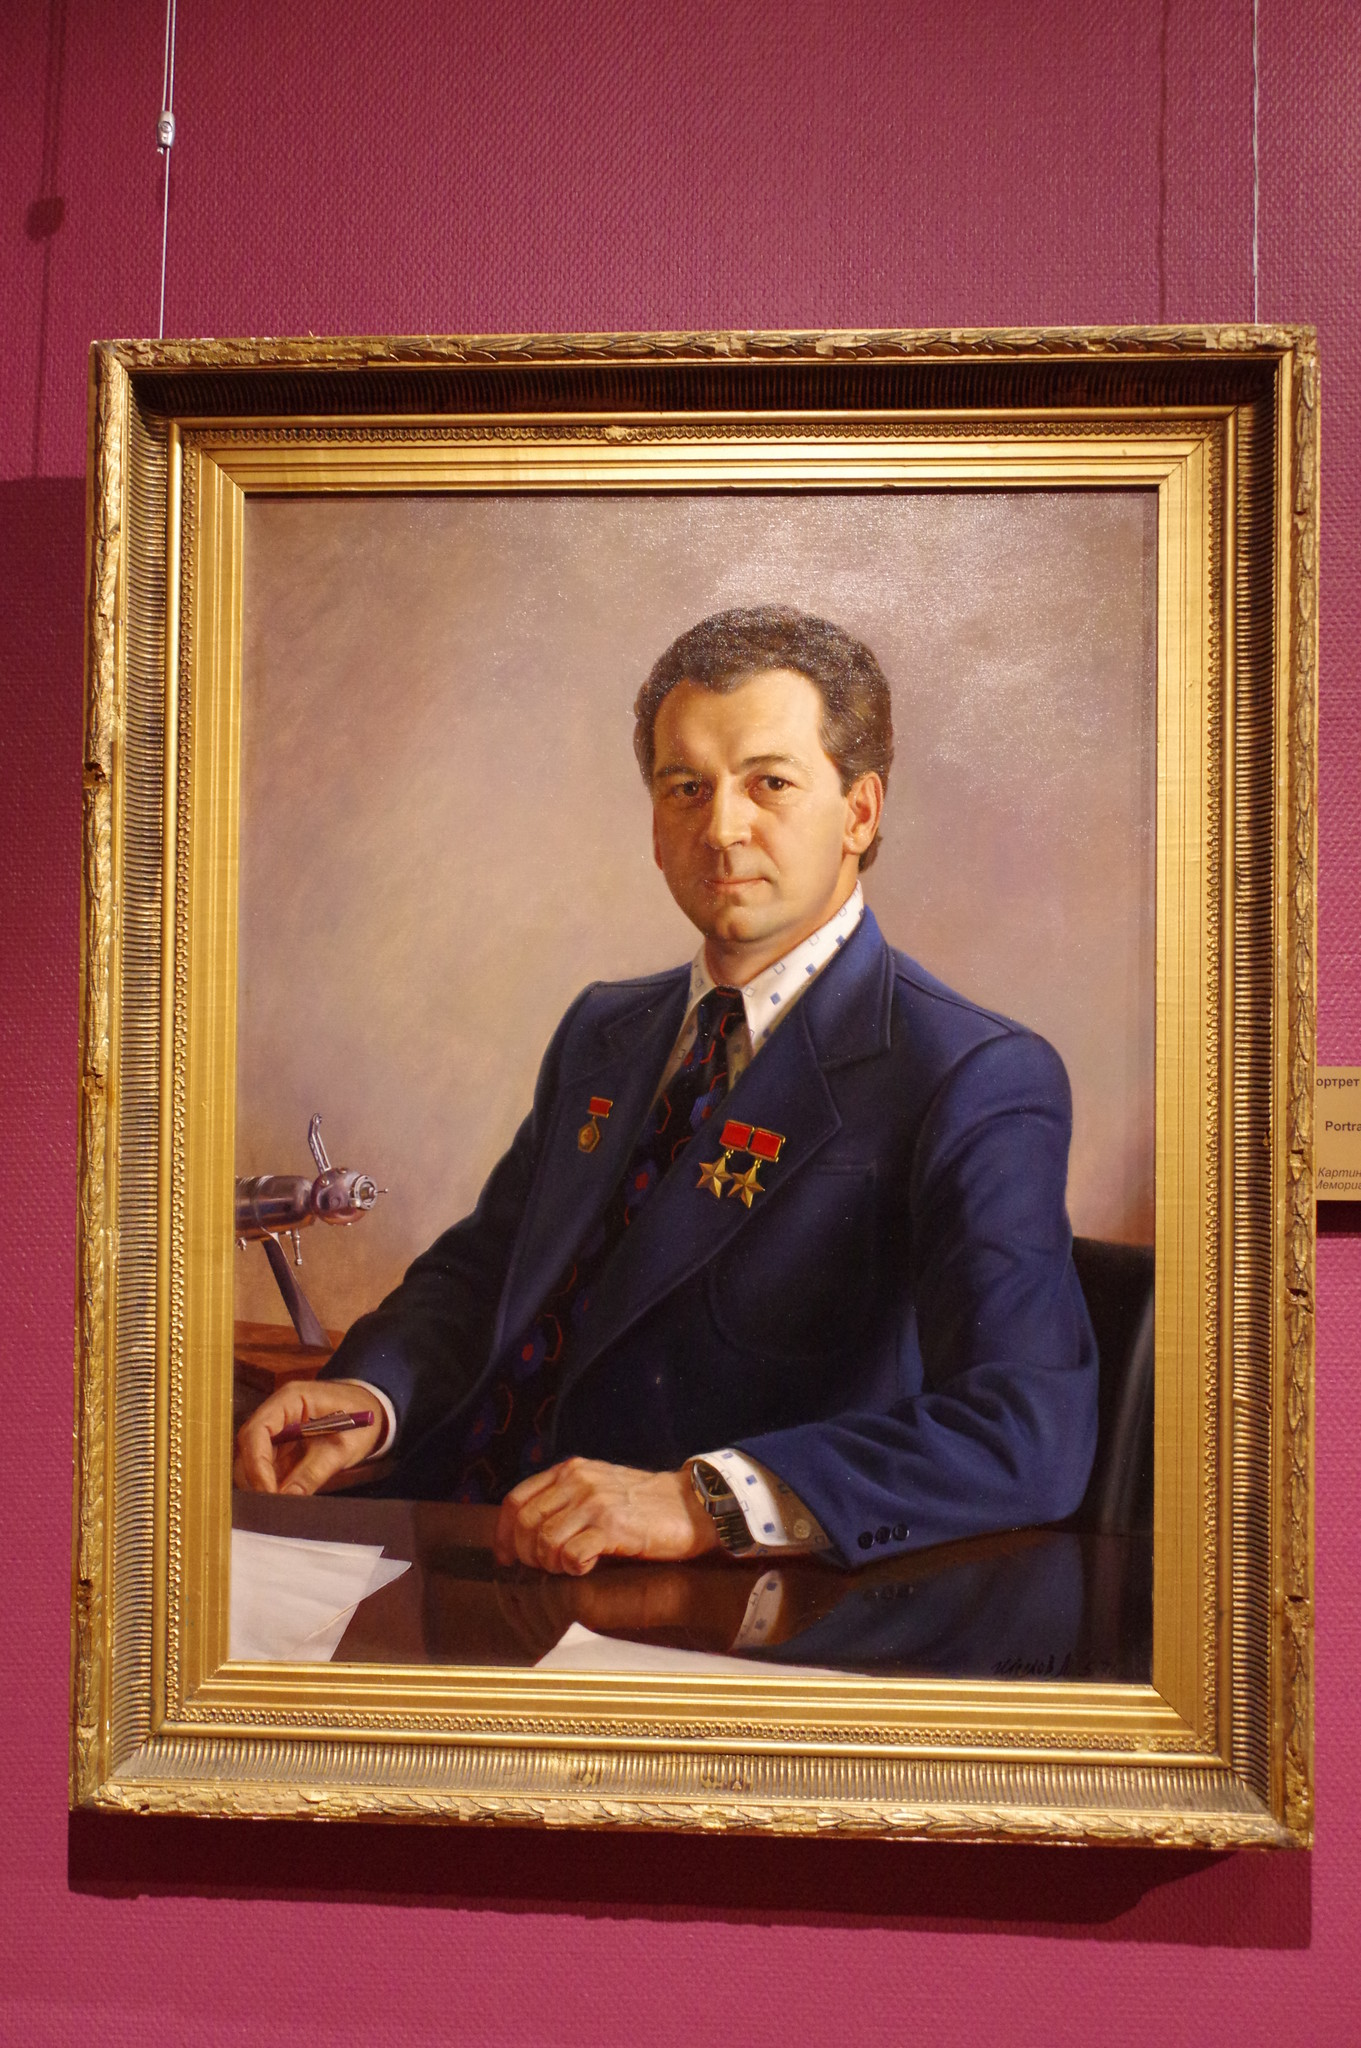 Портрет лётчика-космонавта Виталия Ивановича Севастьянова. Александр Шилов, холст, масло, 1976